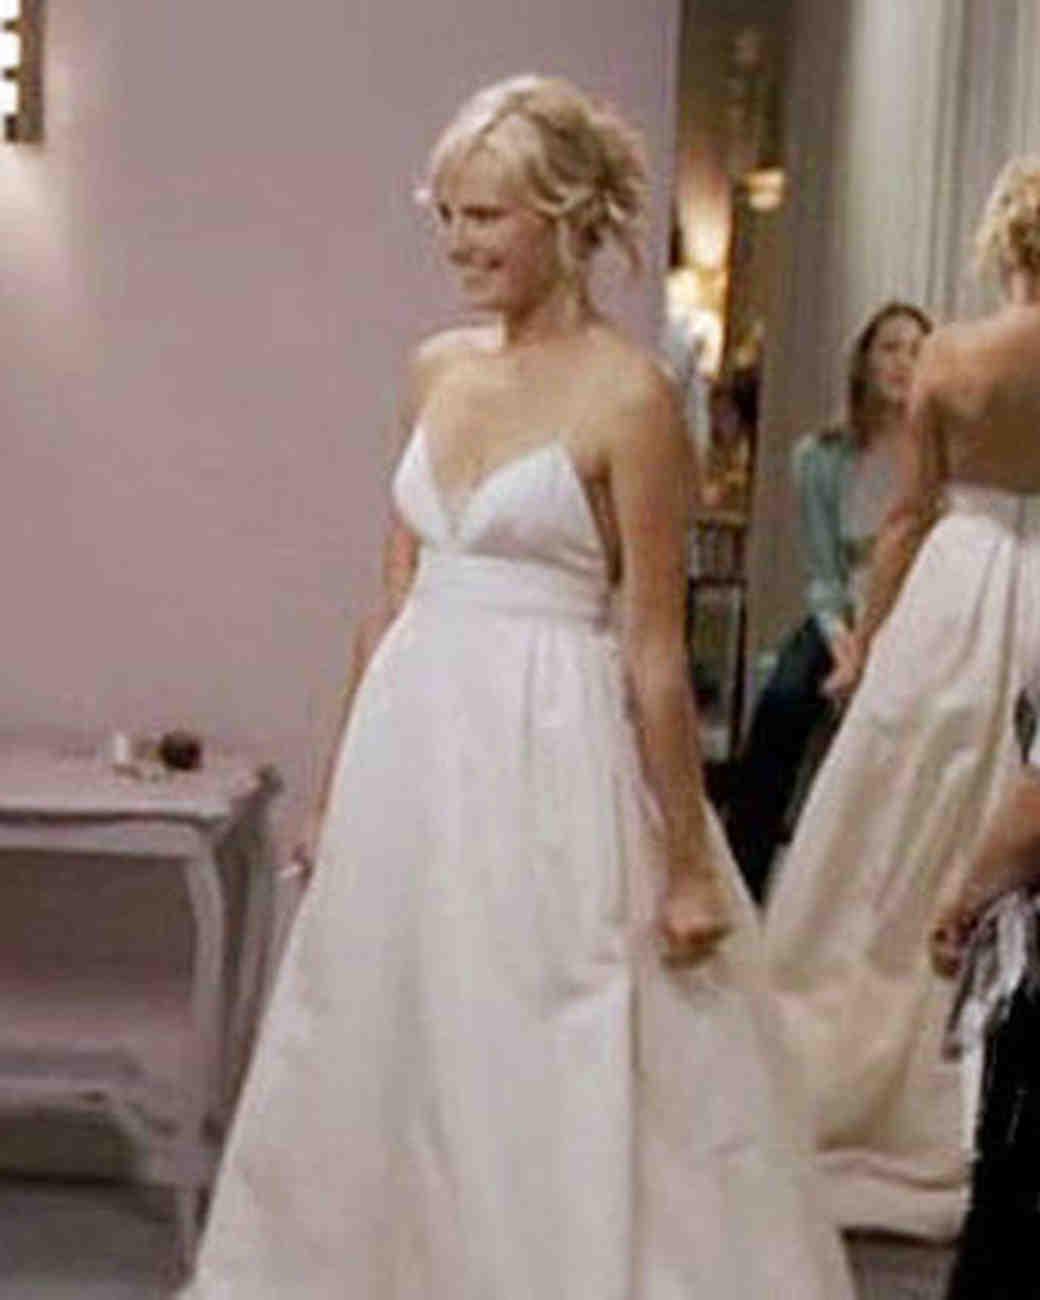 movie-wedding-dresses-27-dresses-malin-akerman-0316.jpg